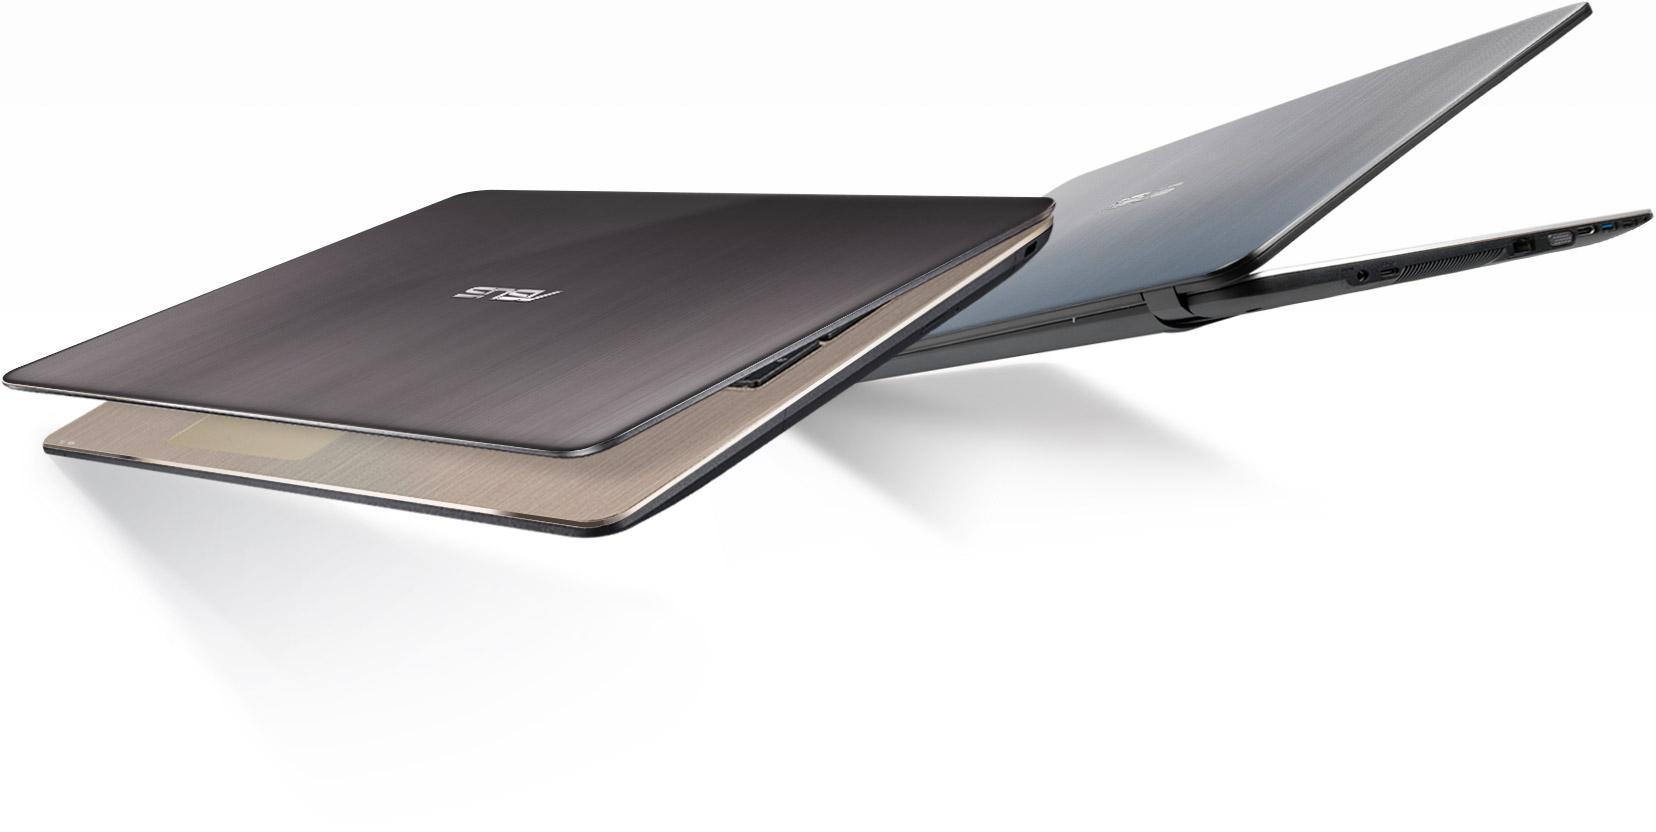 Огляд доступного ультрабука ASUS VivoBook X540YA